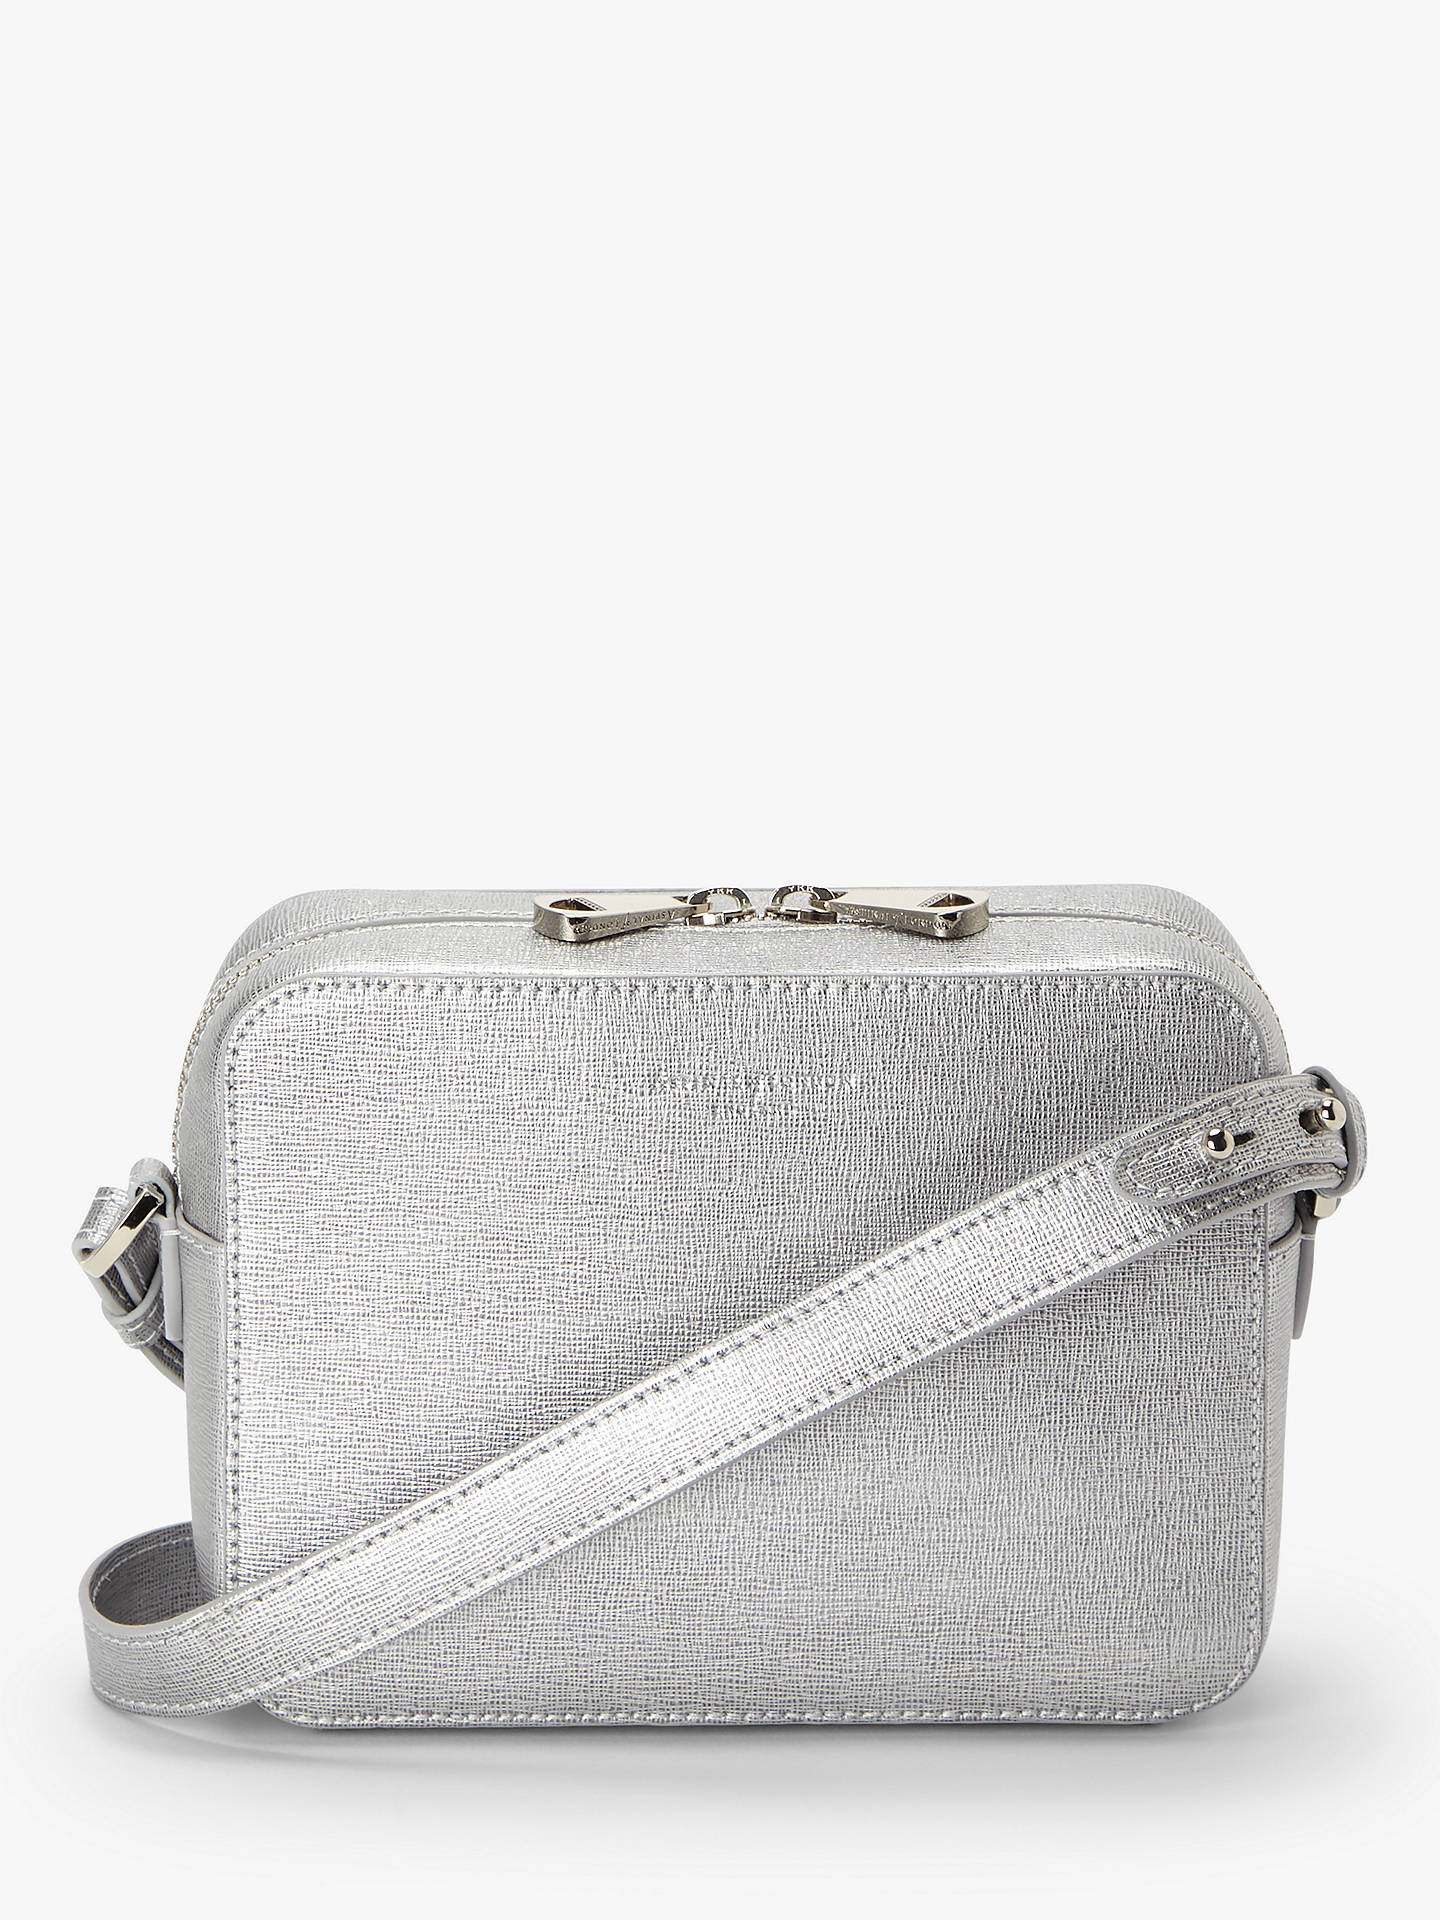 feb116921378 Aspinal of London Leather Camera Cross Body Bag at John Lewis   Partners